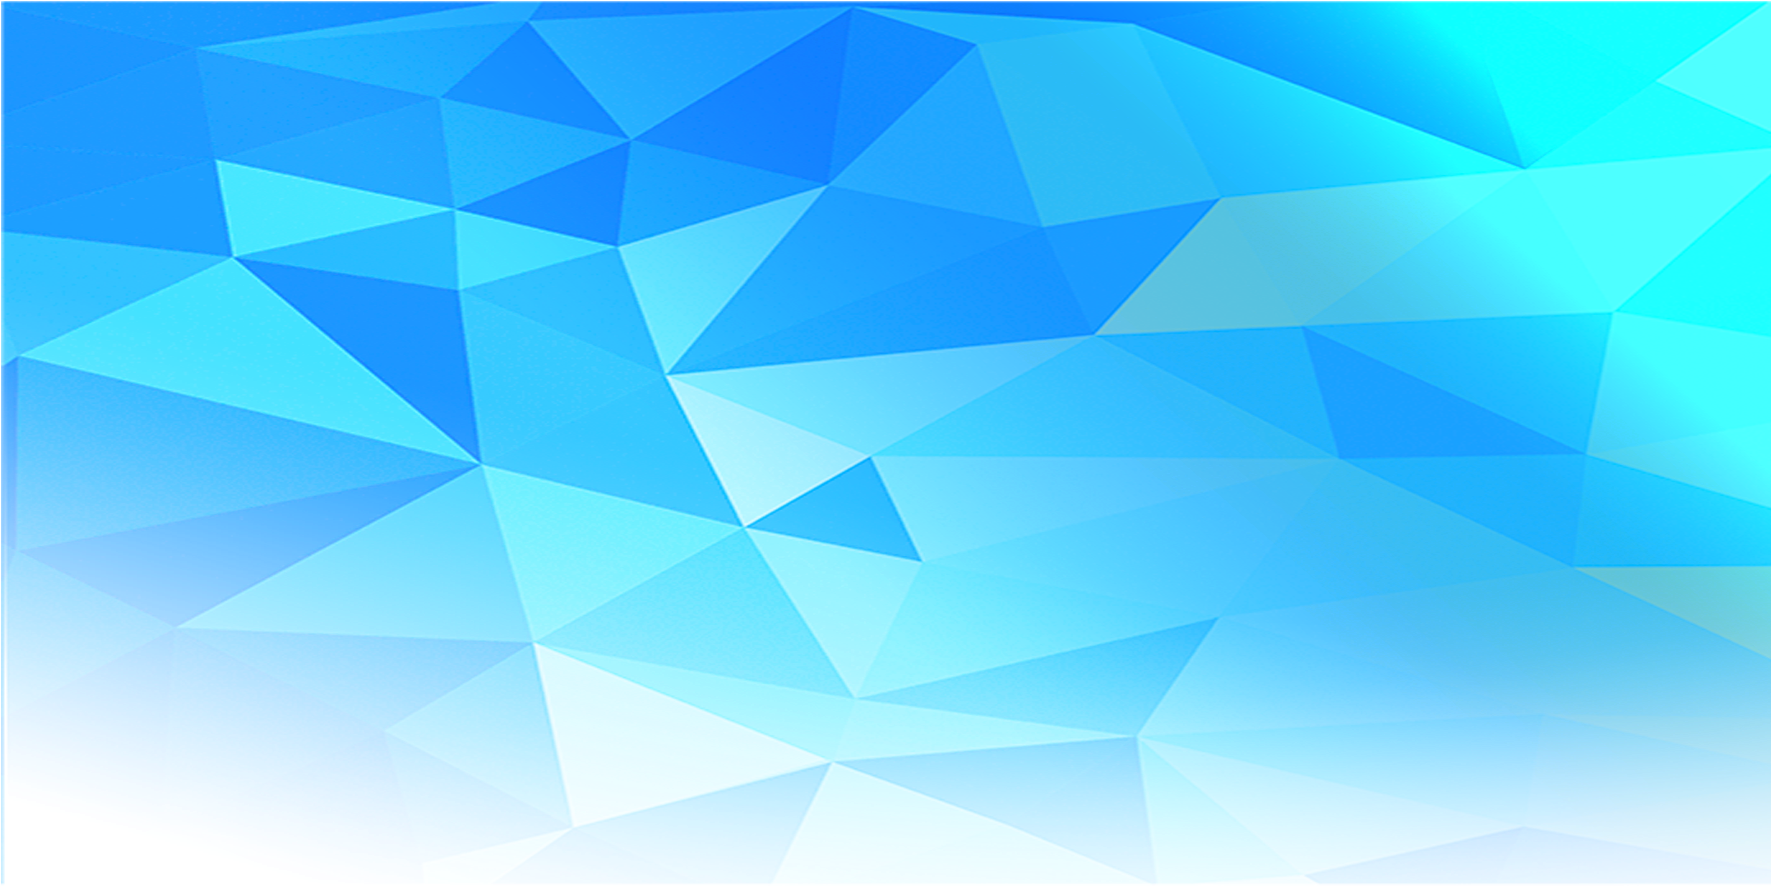 Download Blue Rhombus Diamond Background - Background Blue Diamond PNG  Image With No Background - PNGkey.com